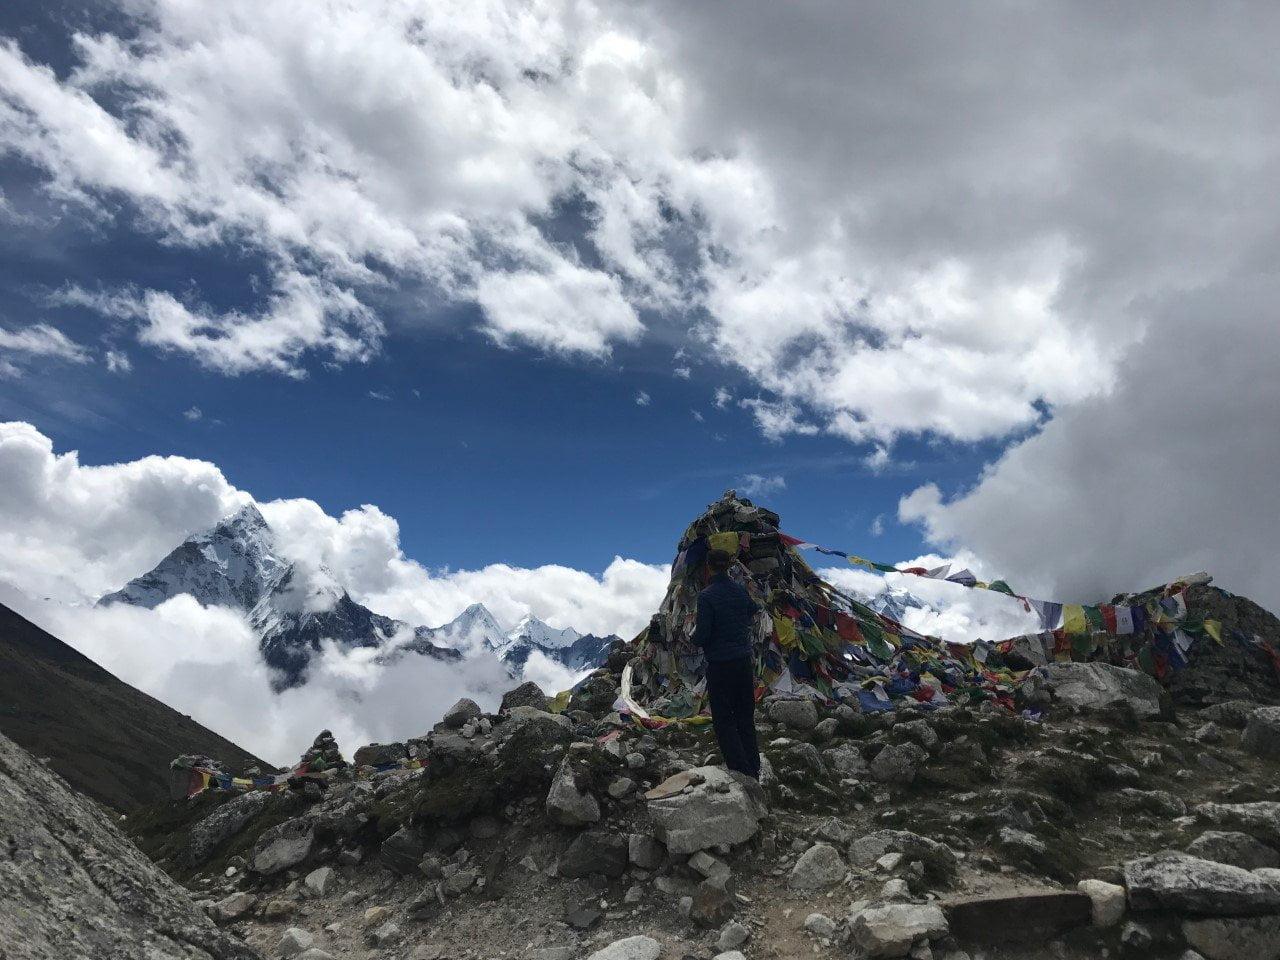 Anna Korenromp Nepal